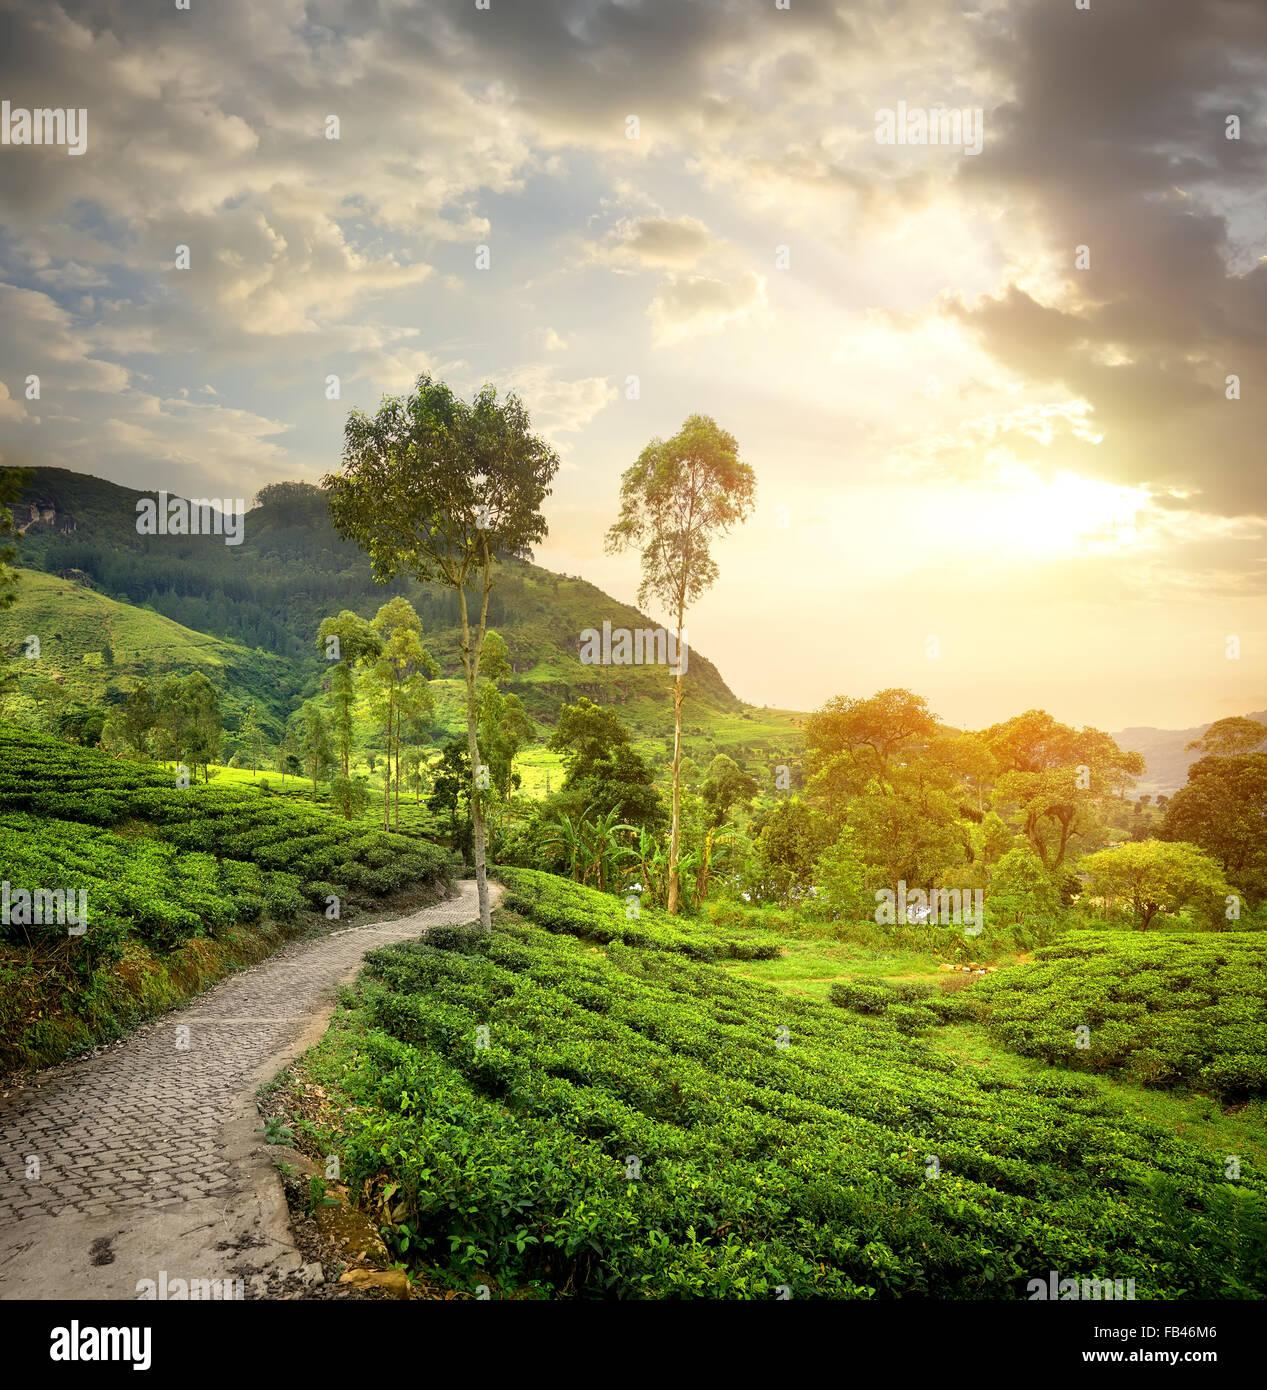 Green tea plantations in Nuwara Eliya and clouds - Stock Image